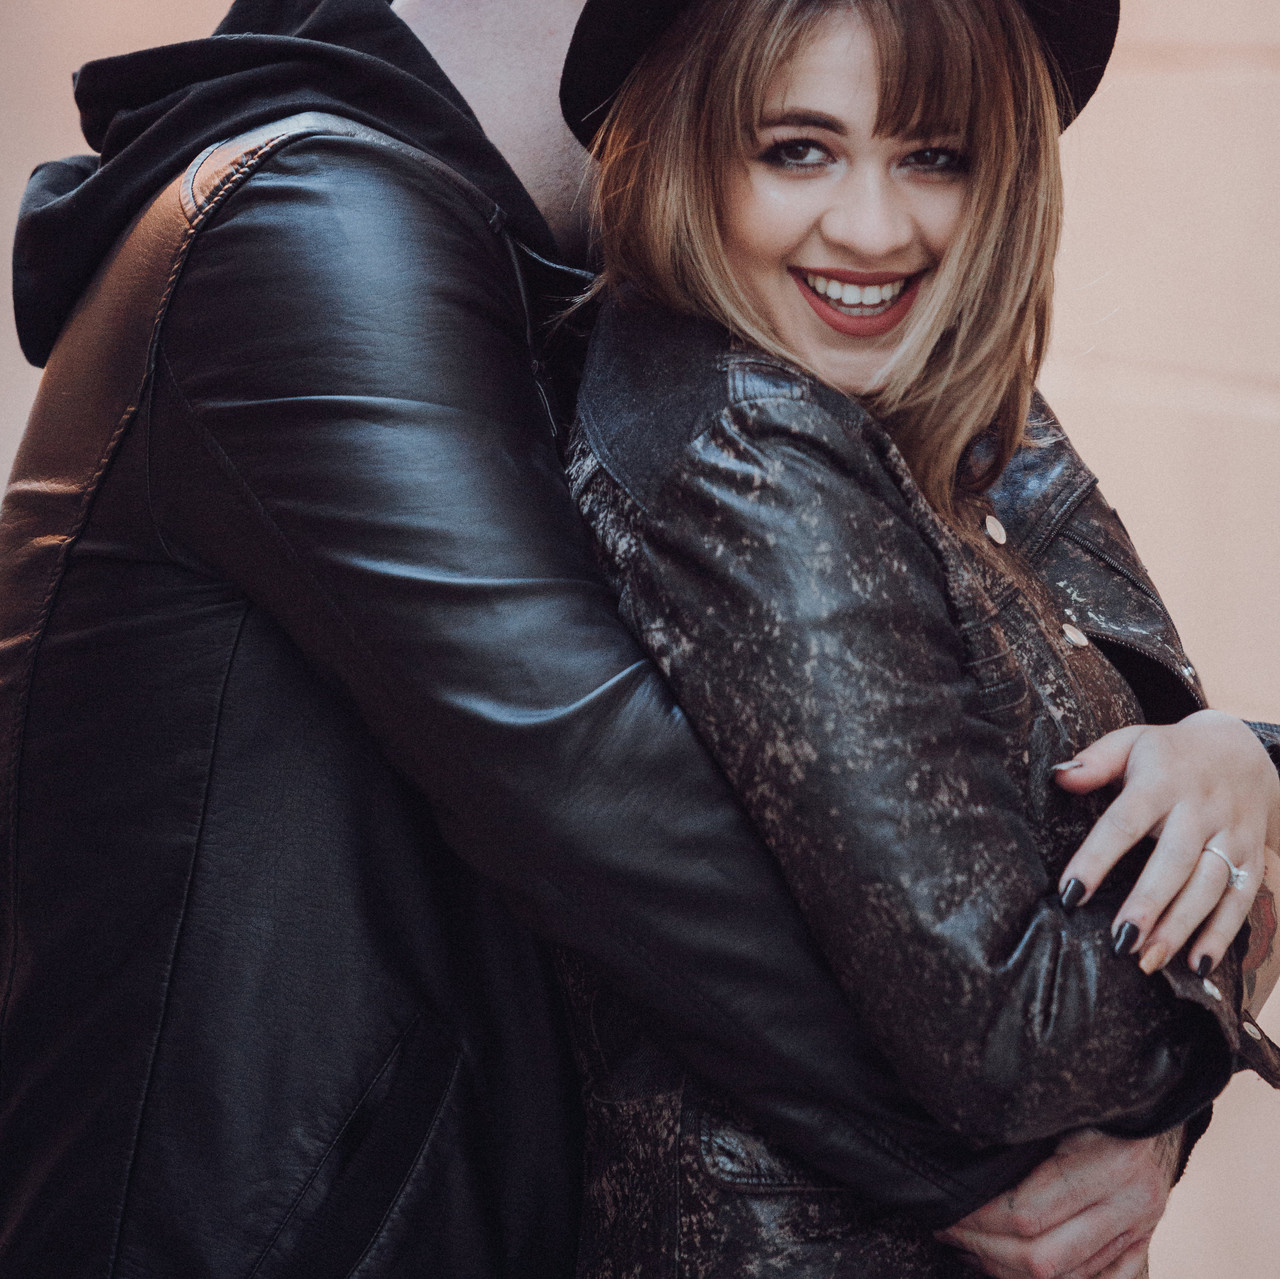 Tim&Antonia-99